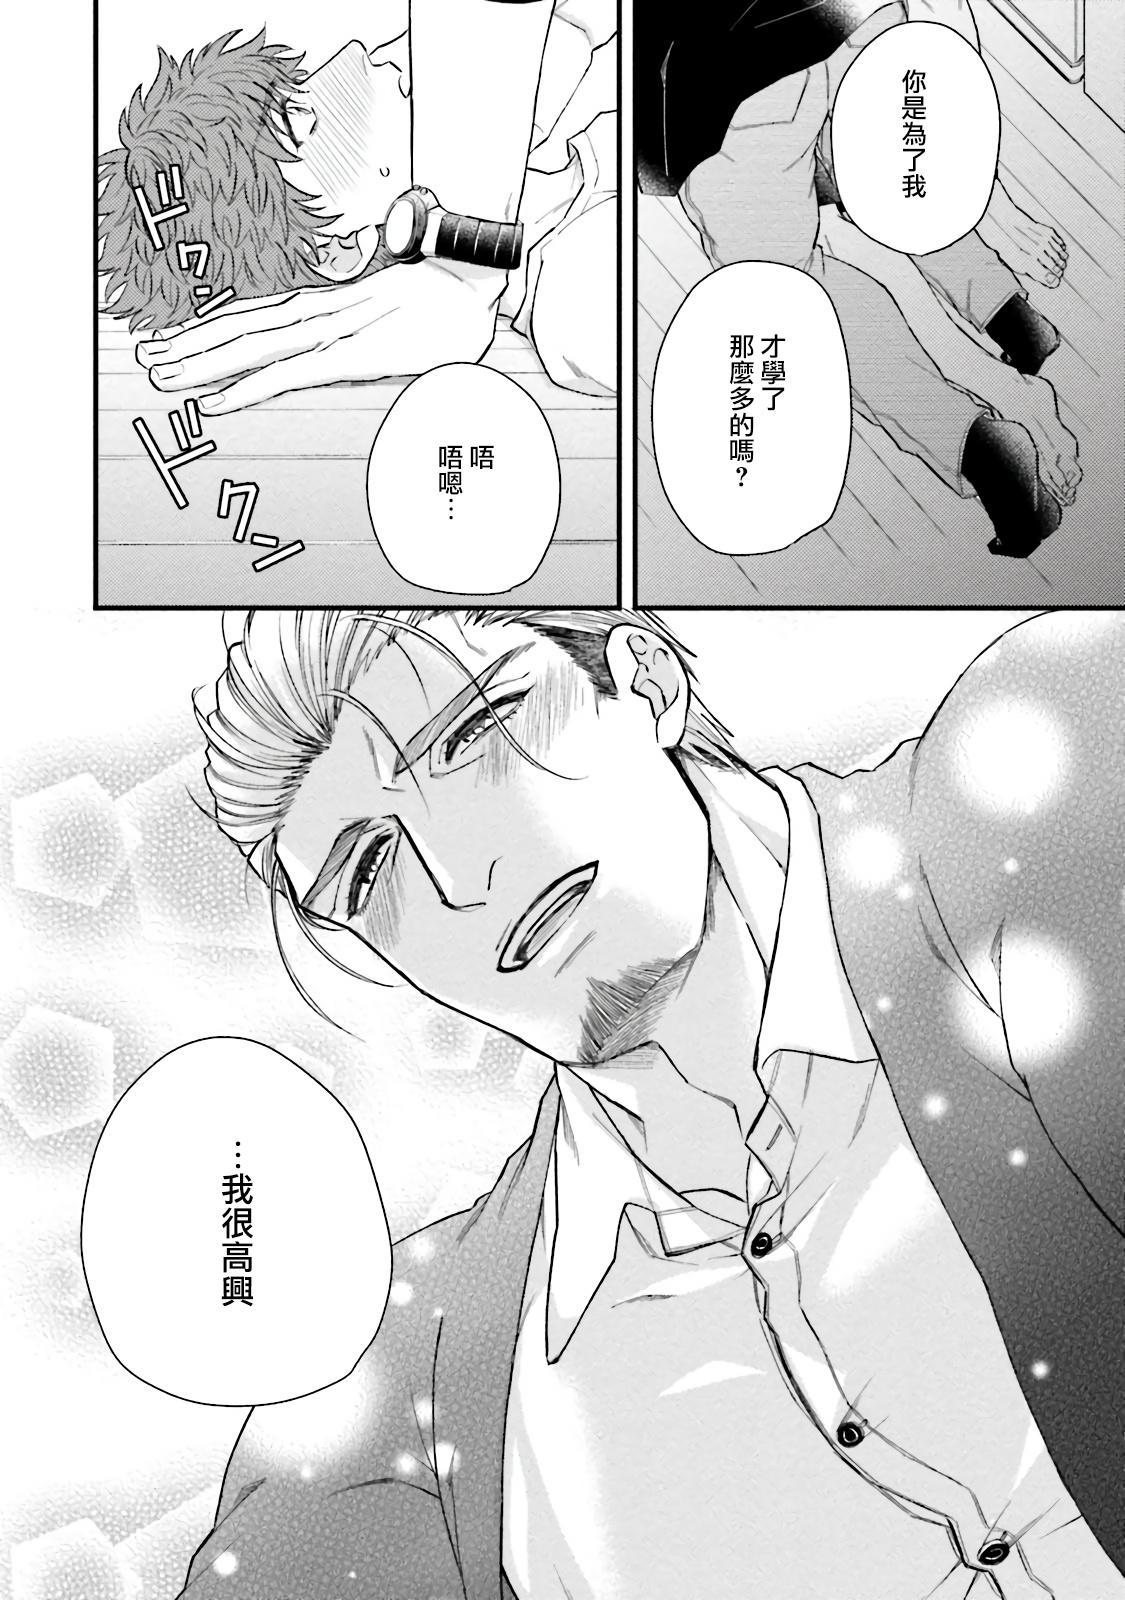 Kinou wa Otanoshimi Deshita ne | 昨天过得很愉快吧 Ch. 1-4+特典 70